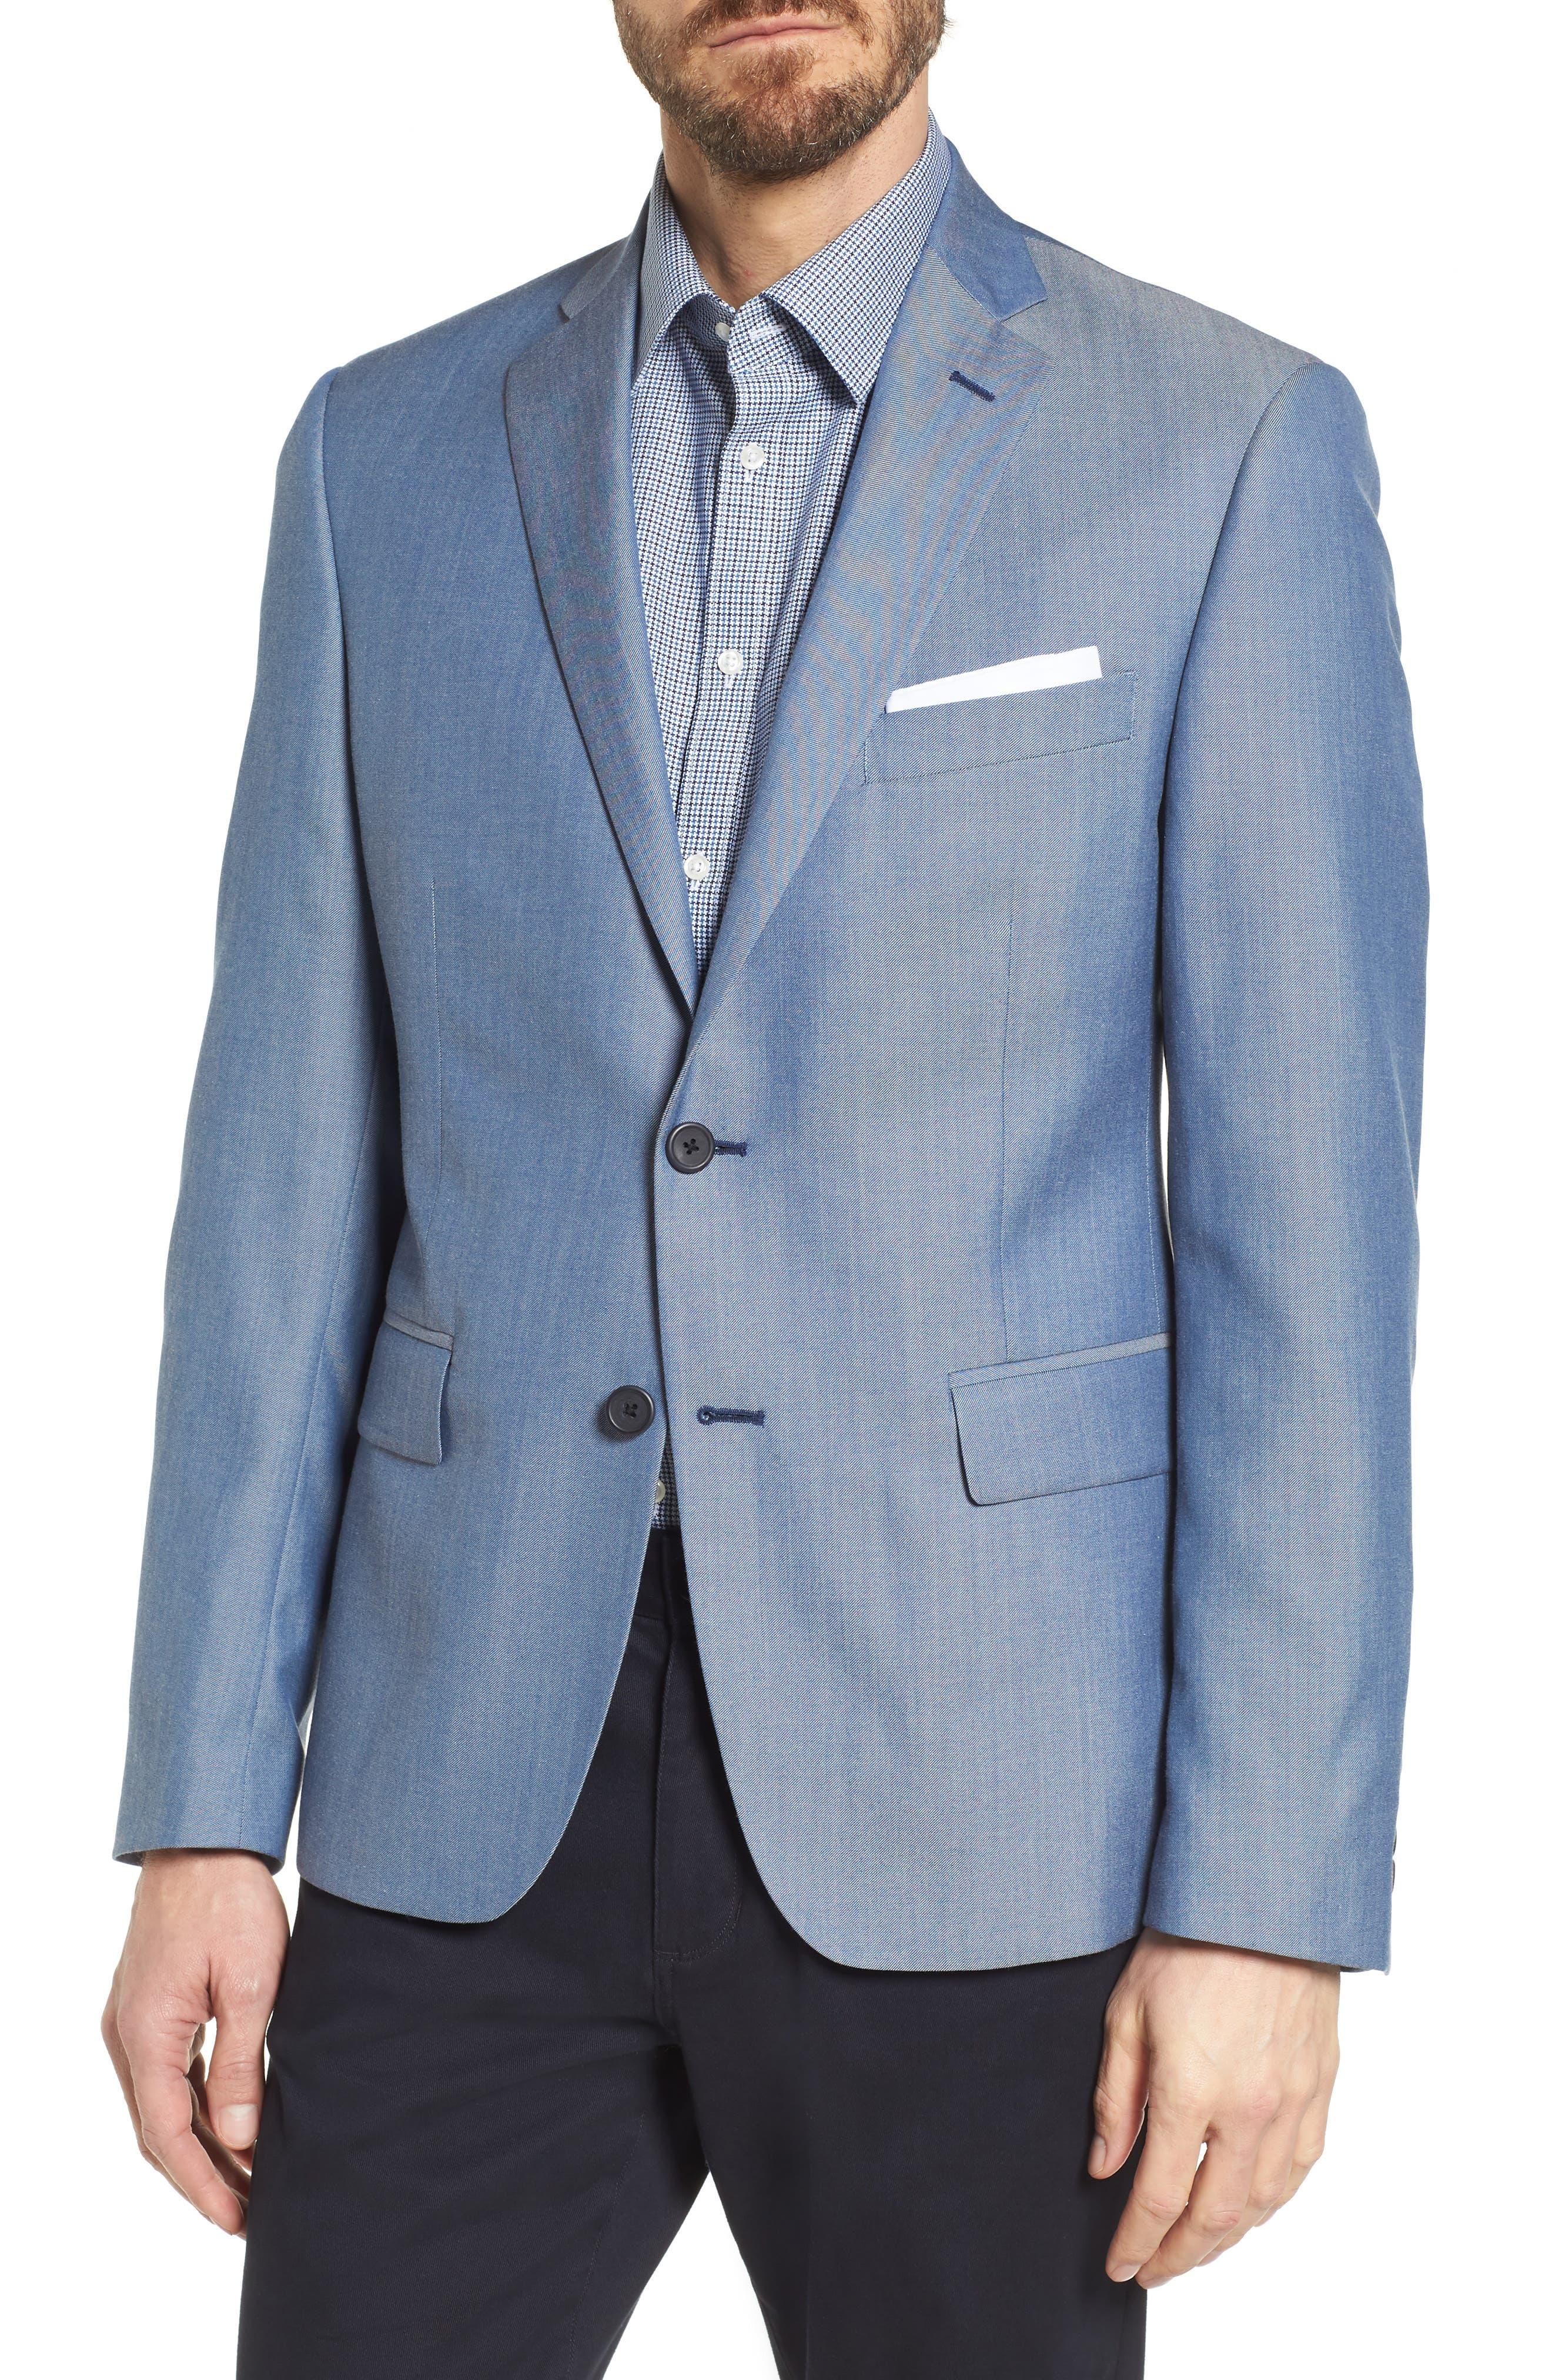 Alternate Image 1 Selected - Nordstrom Men's Shop Trim Fit Wool & Cotton Blazer